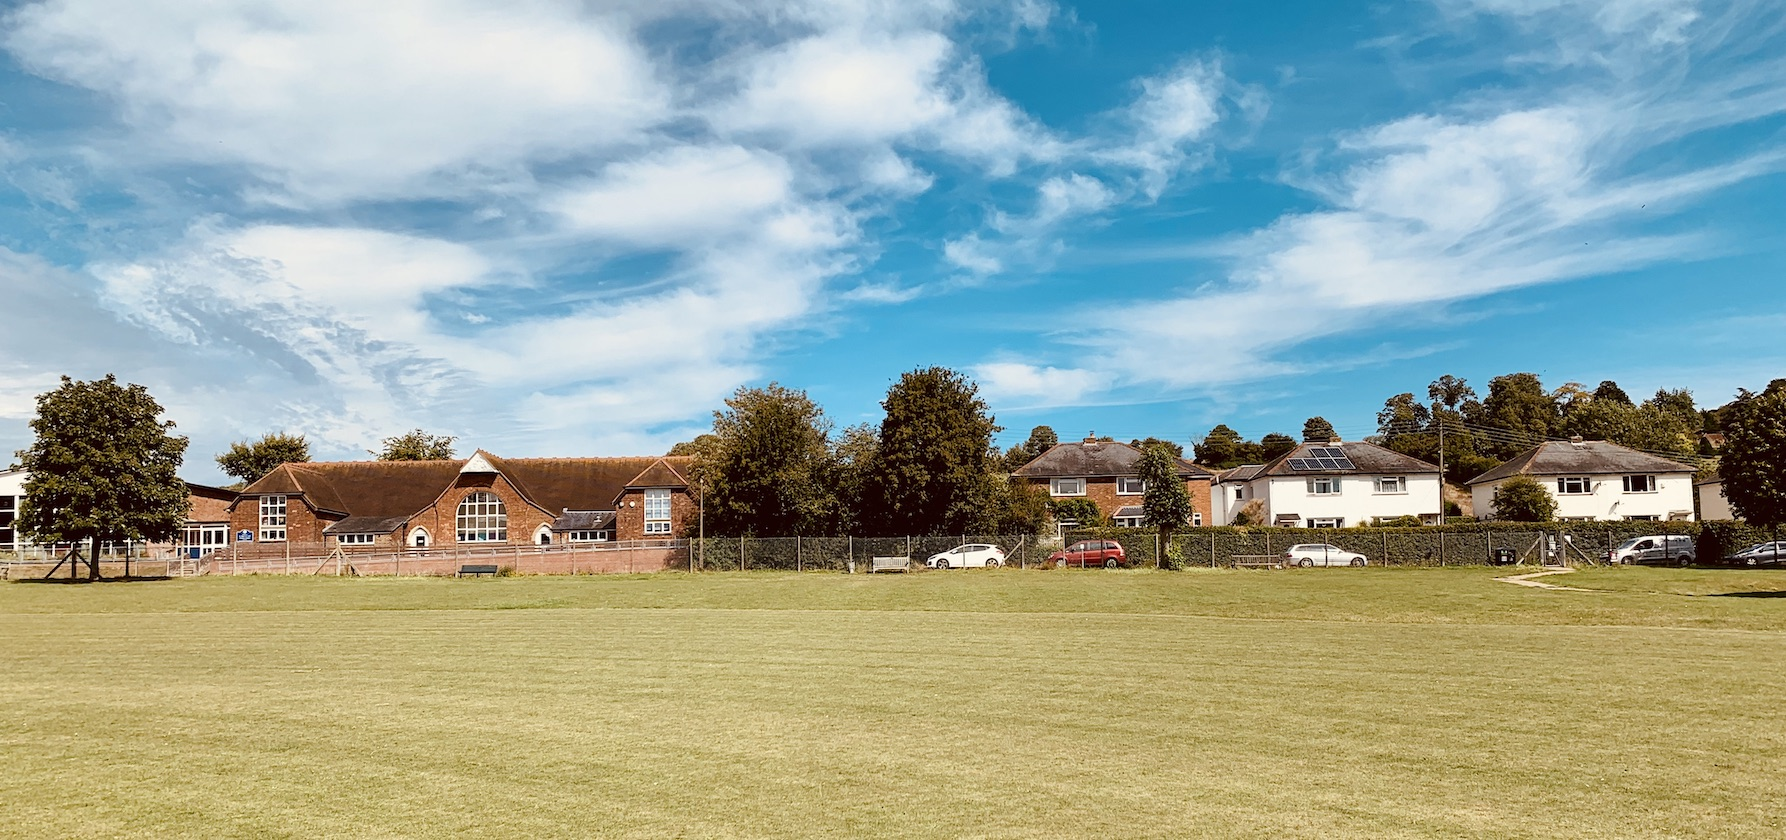 Barn Meadow Recreation Ground.